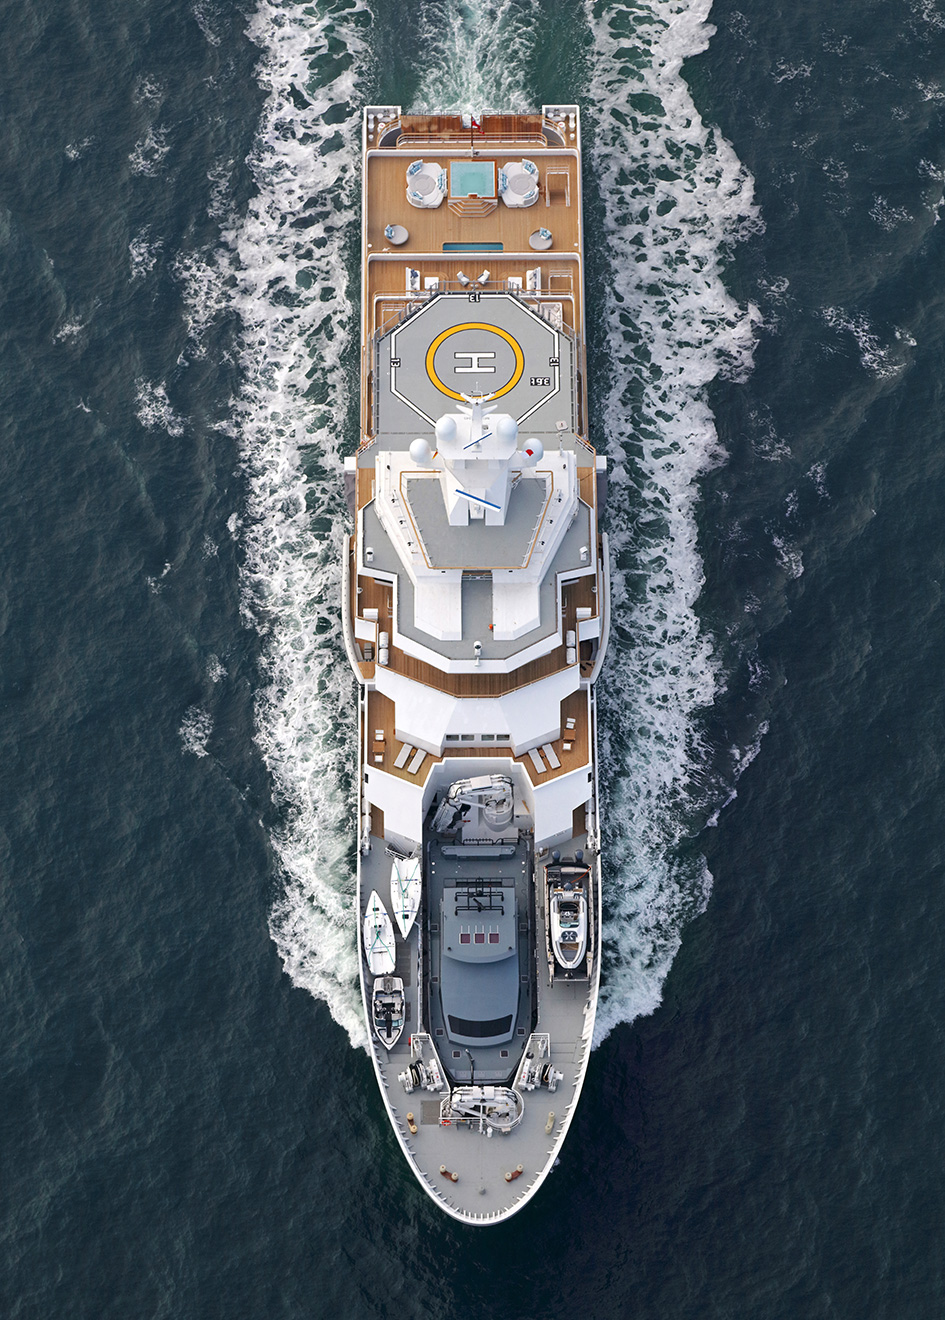 aerial-running-shot-of-kleven-explorer-yacht-ulysses